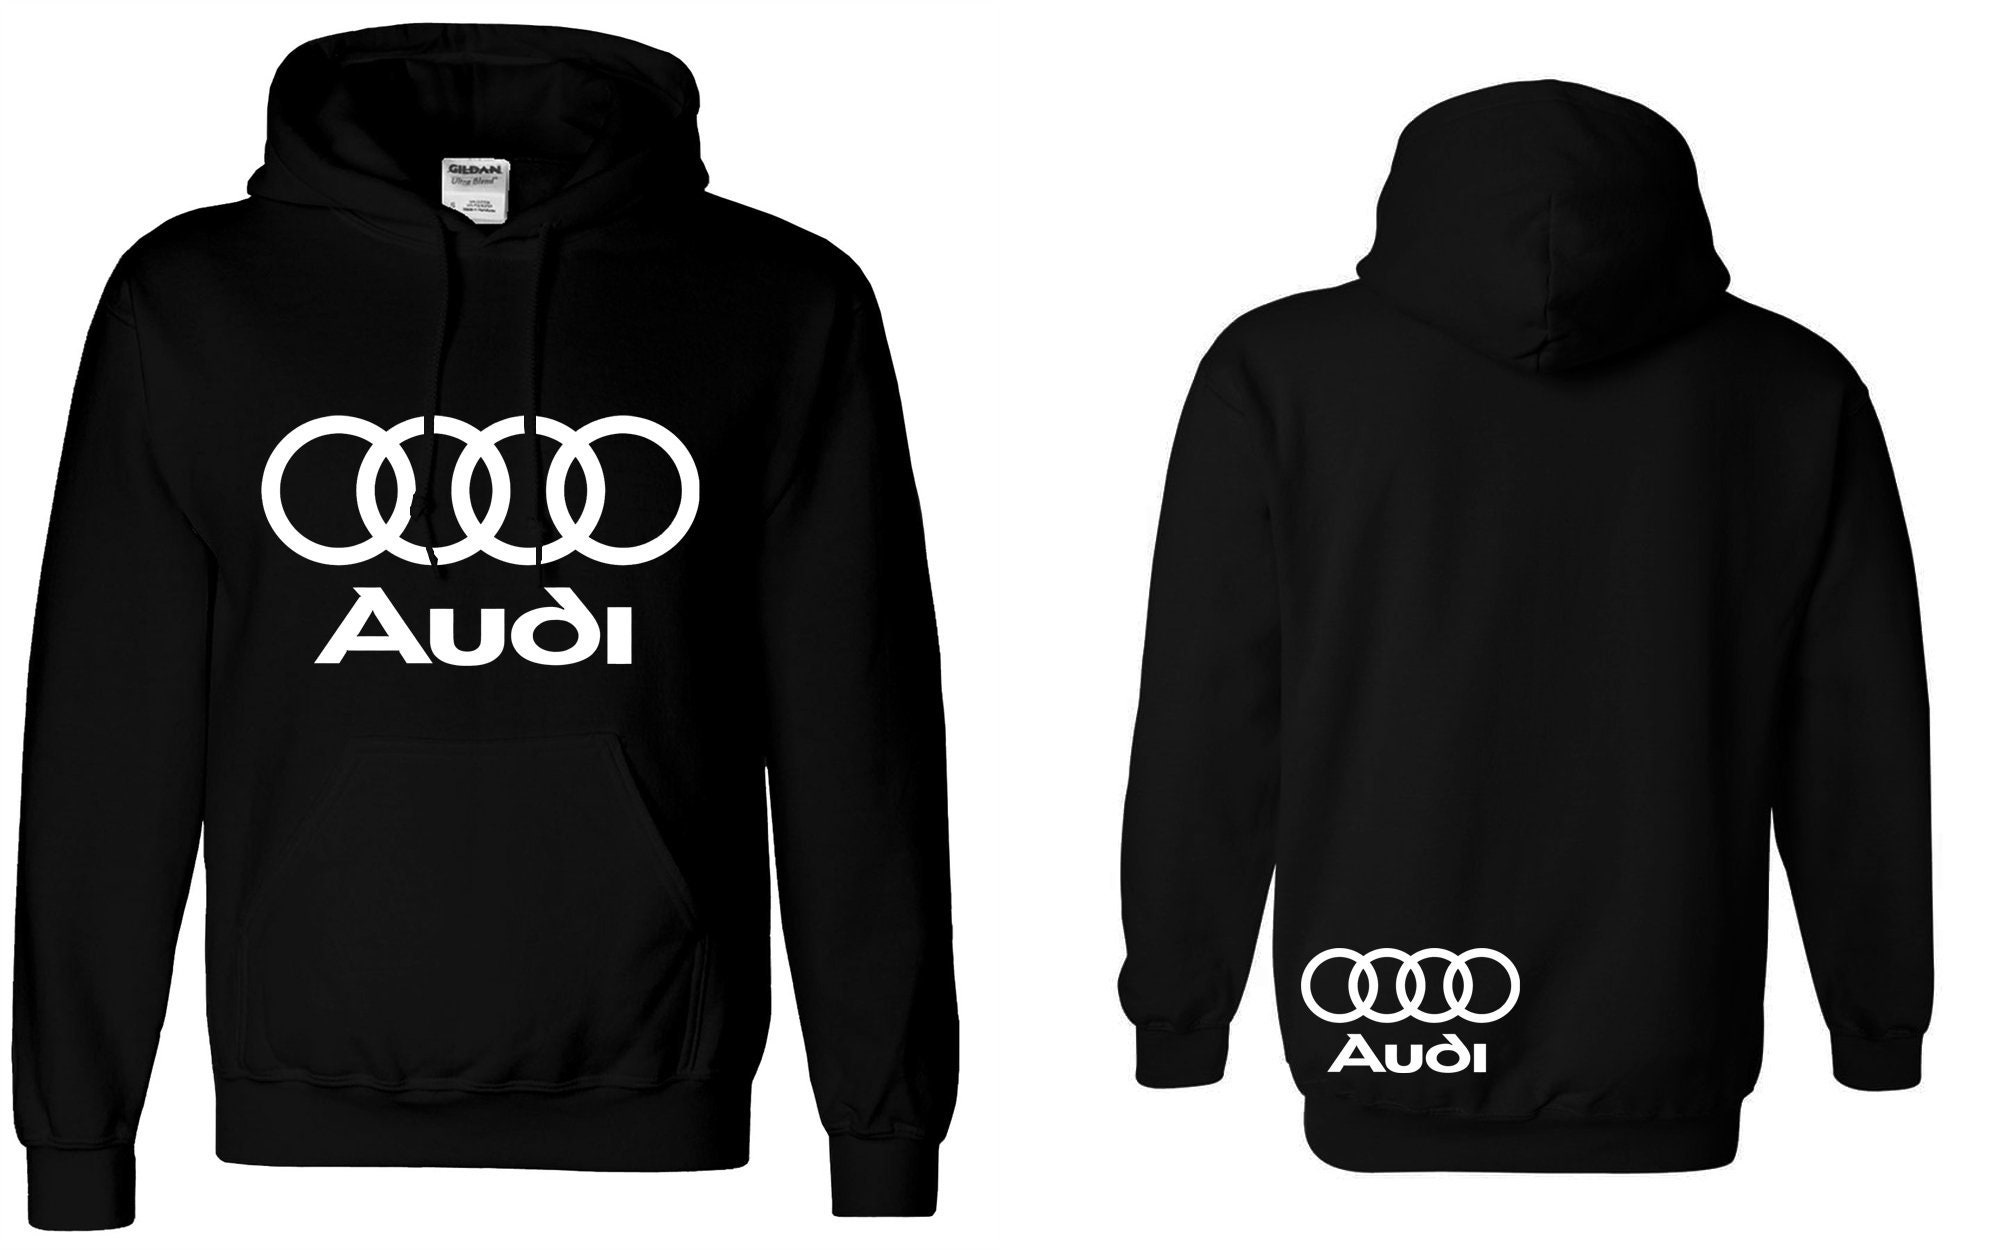 Audi Sweat Sweat Audi à capuche de course voitures Dope allemand JDM A4 A3  pull unisexe a204caaa823f